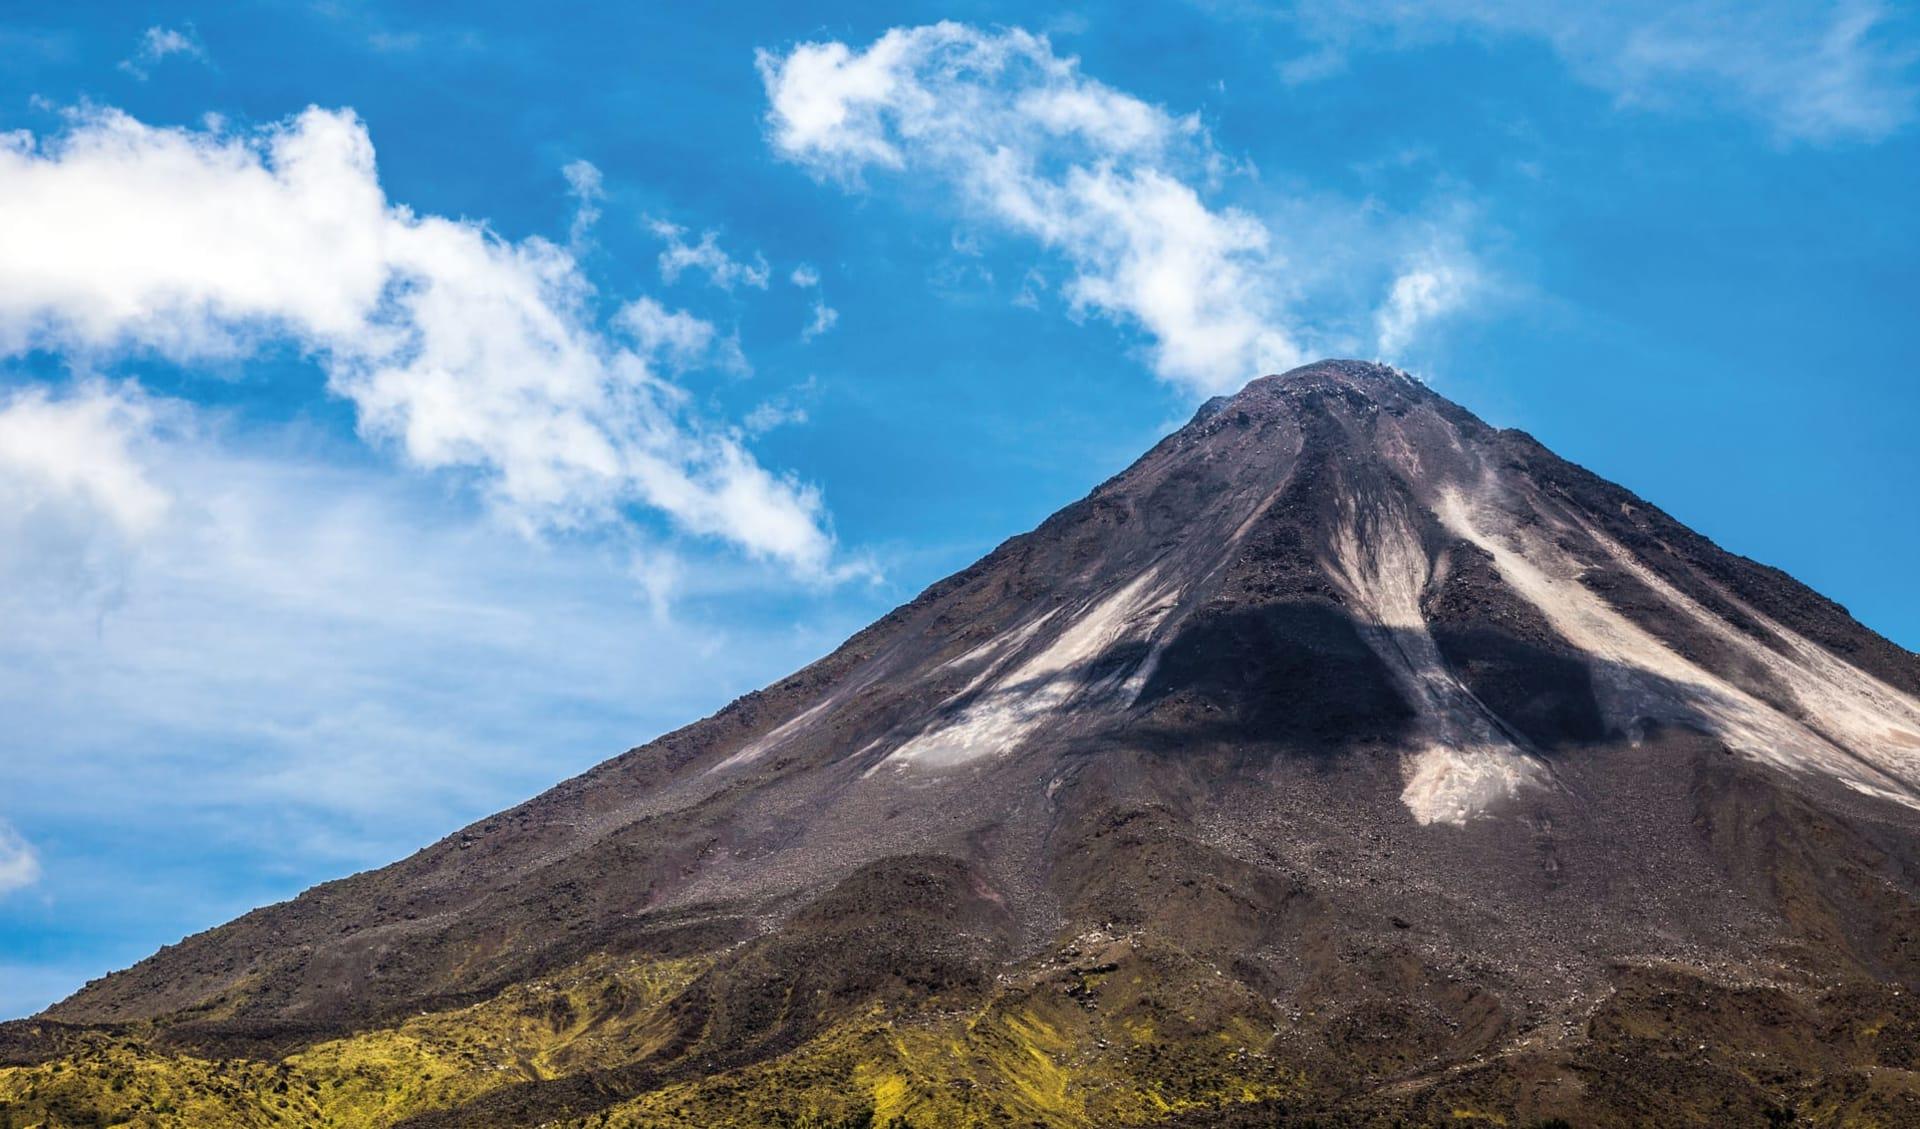 Gruppenreise Mundo Verde ab San José City: Costa Rica - Arenal Vulkan - Sicht auf Vulkan